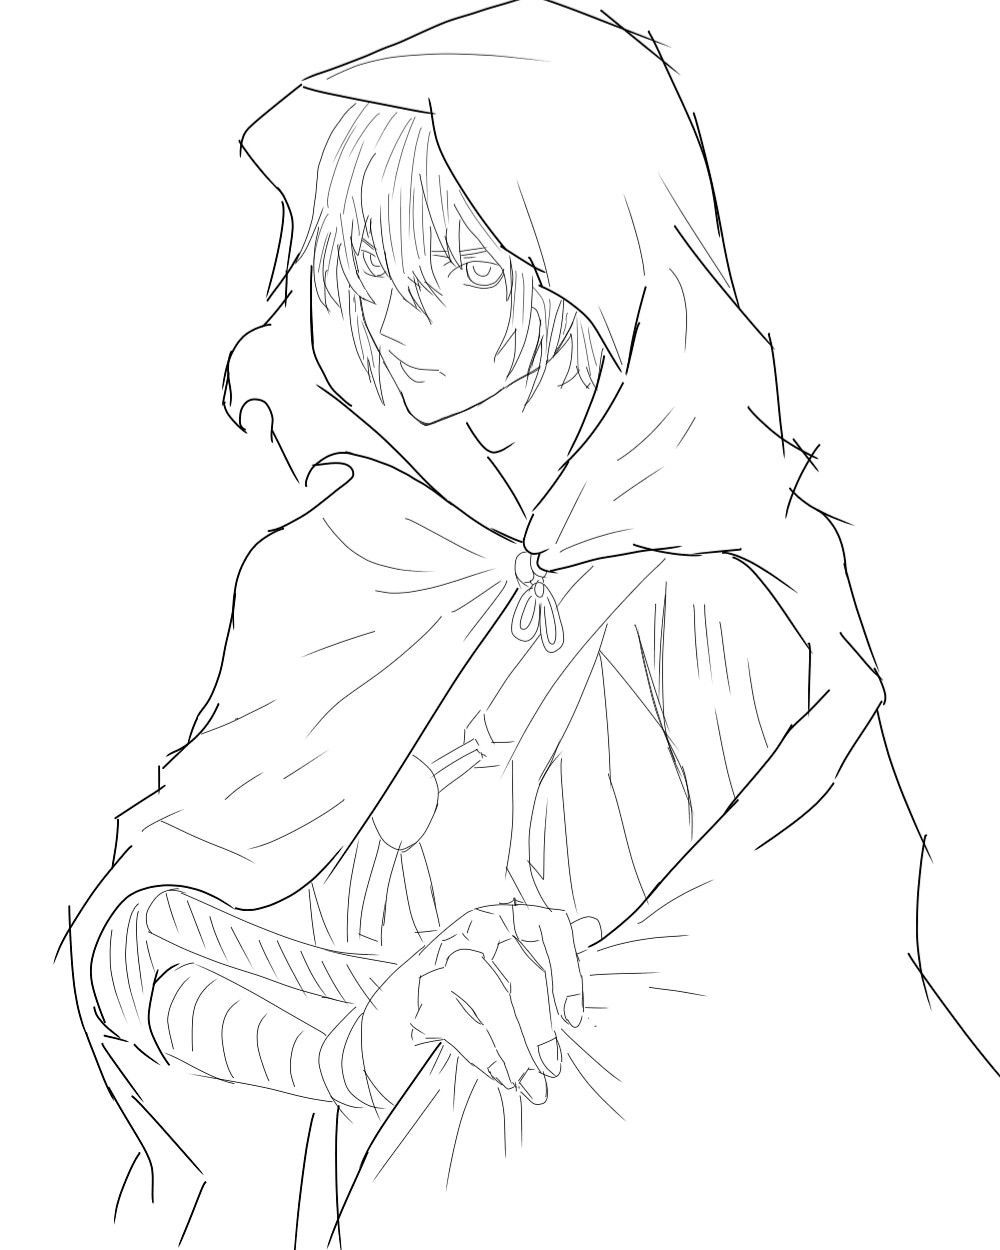 croquis d'anime - #anime #sketch - #drawingchallenge